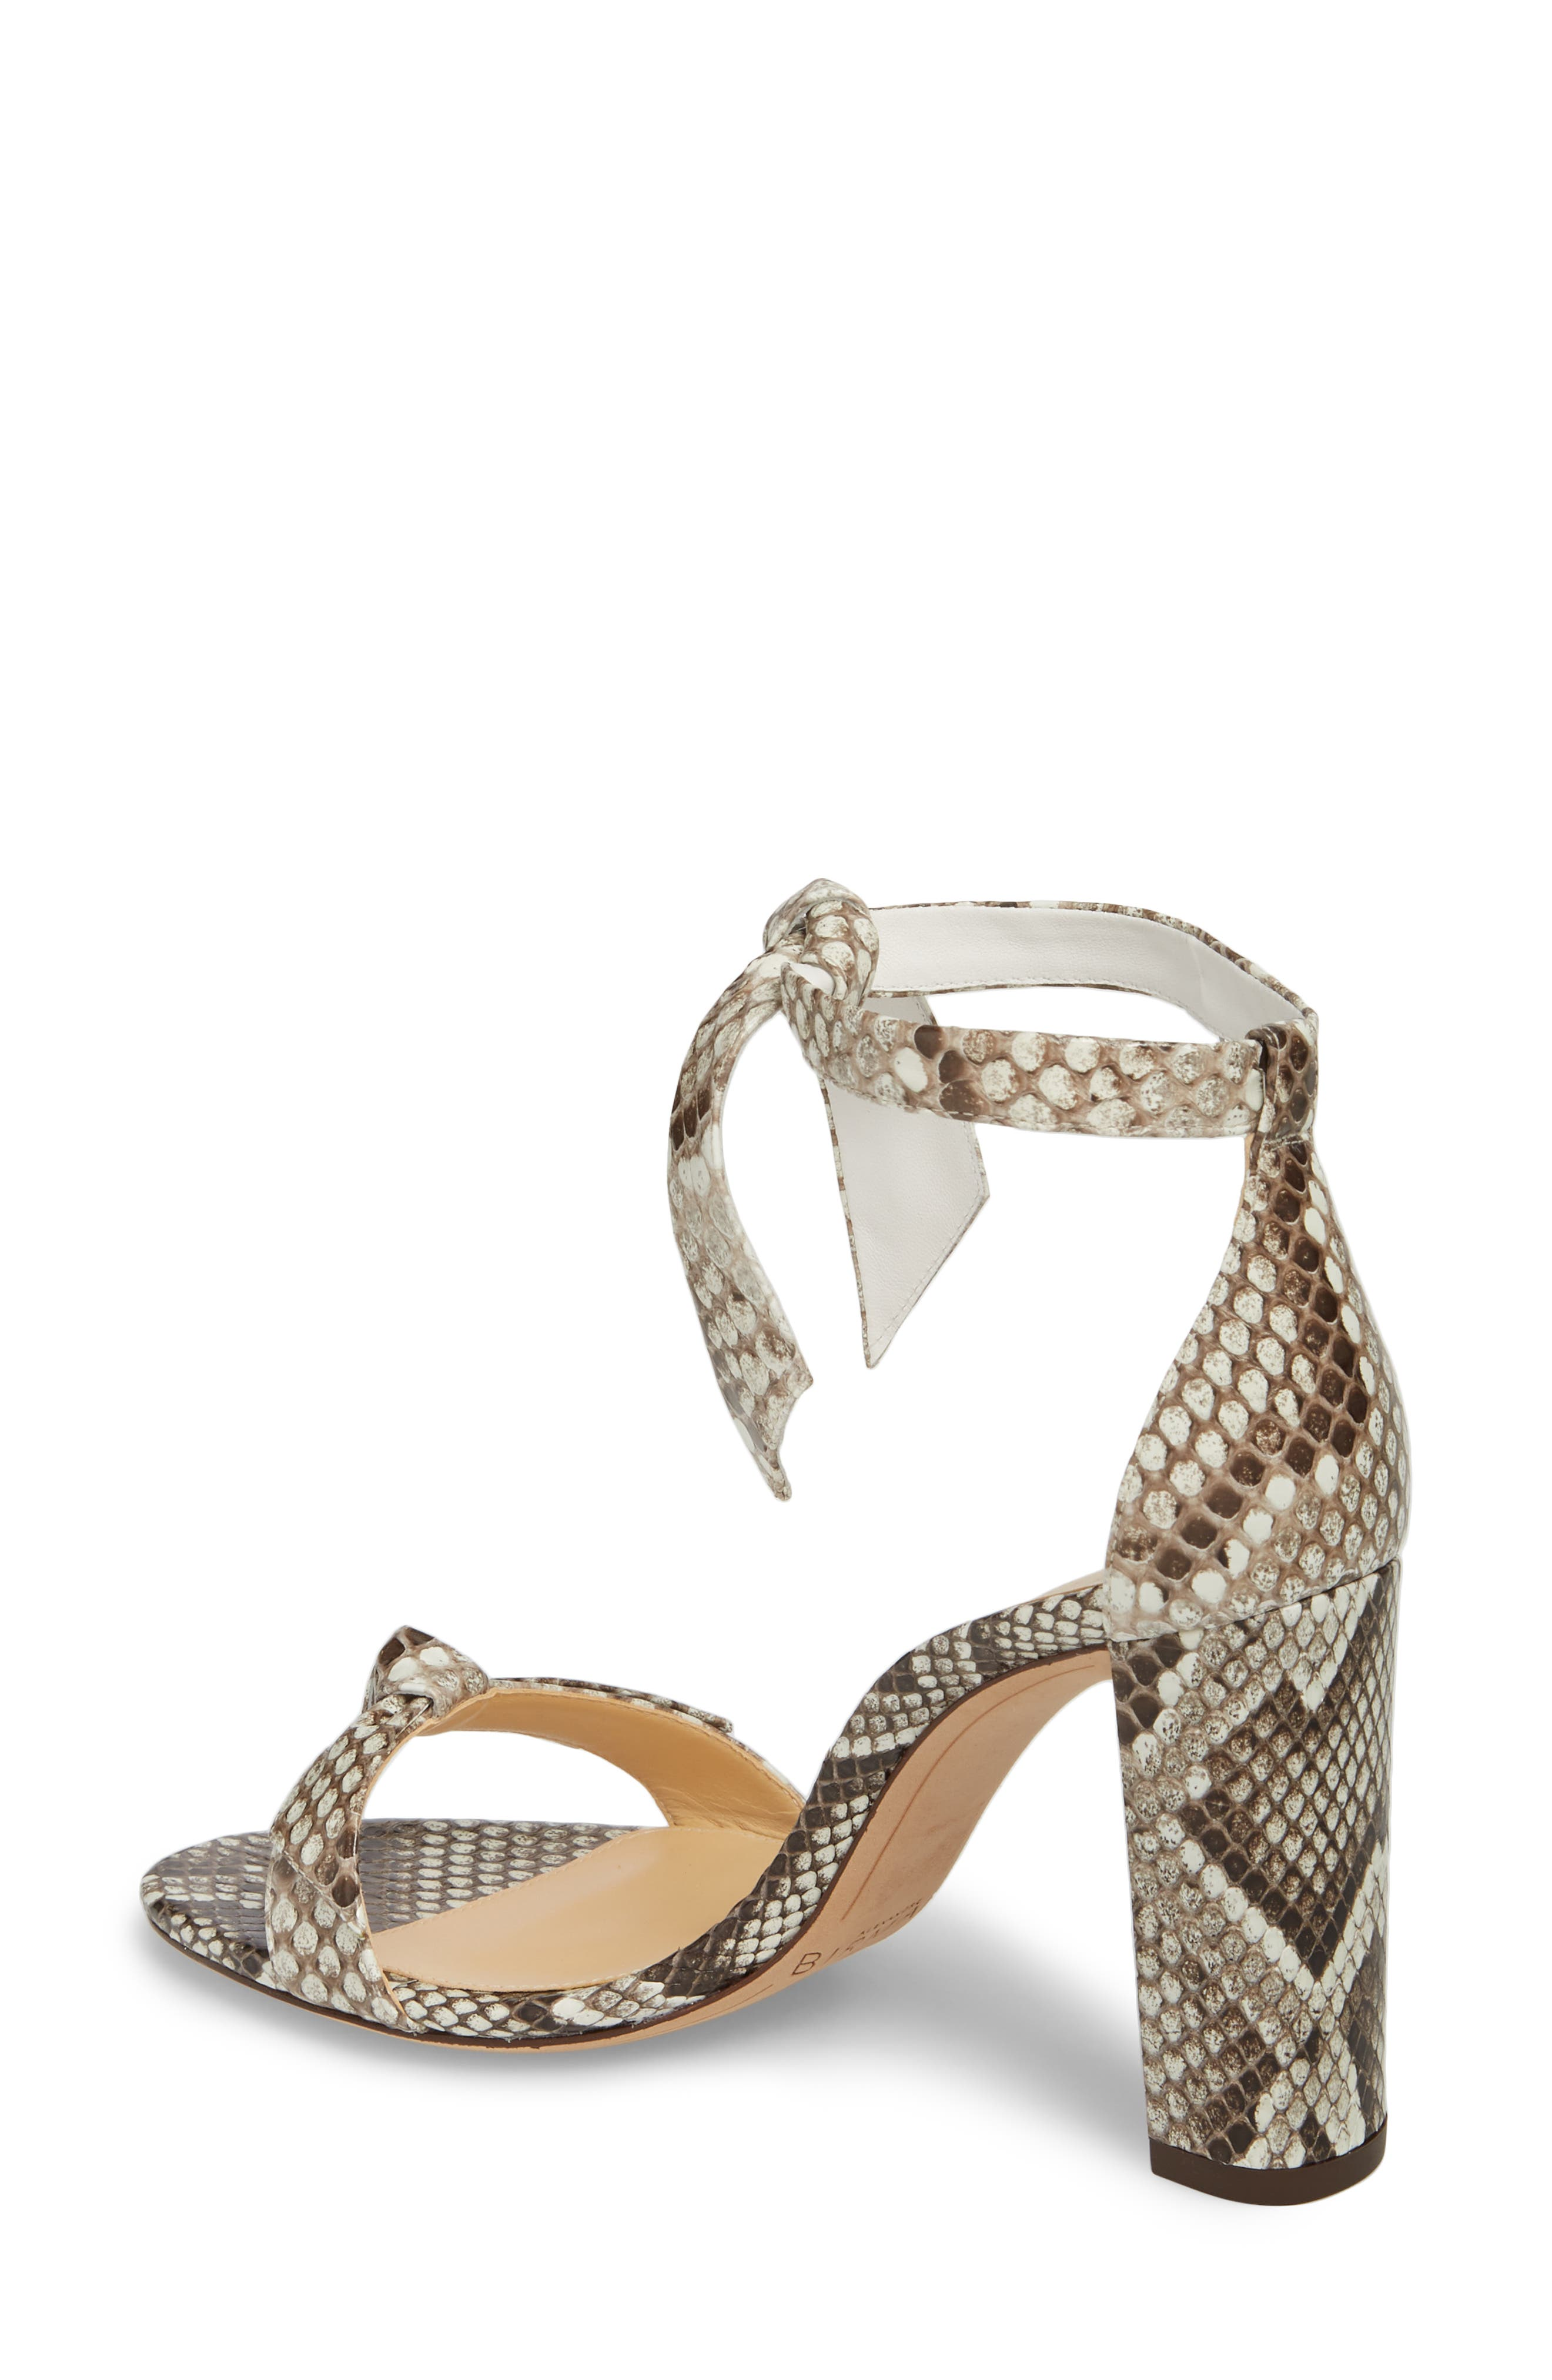 Clarita Genuine Python Ankle Tie Sandal,                             Alternate thumbnail 2, color,                             250